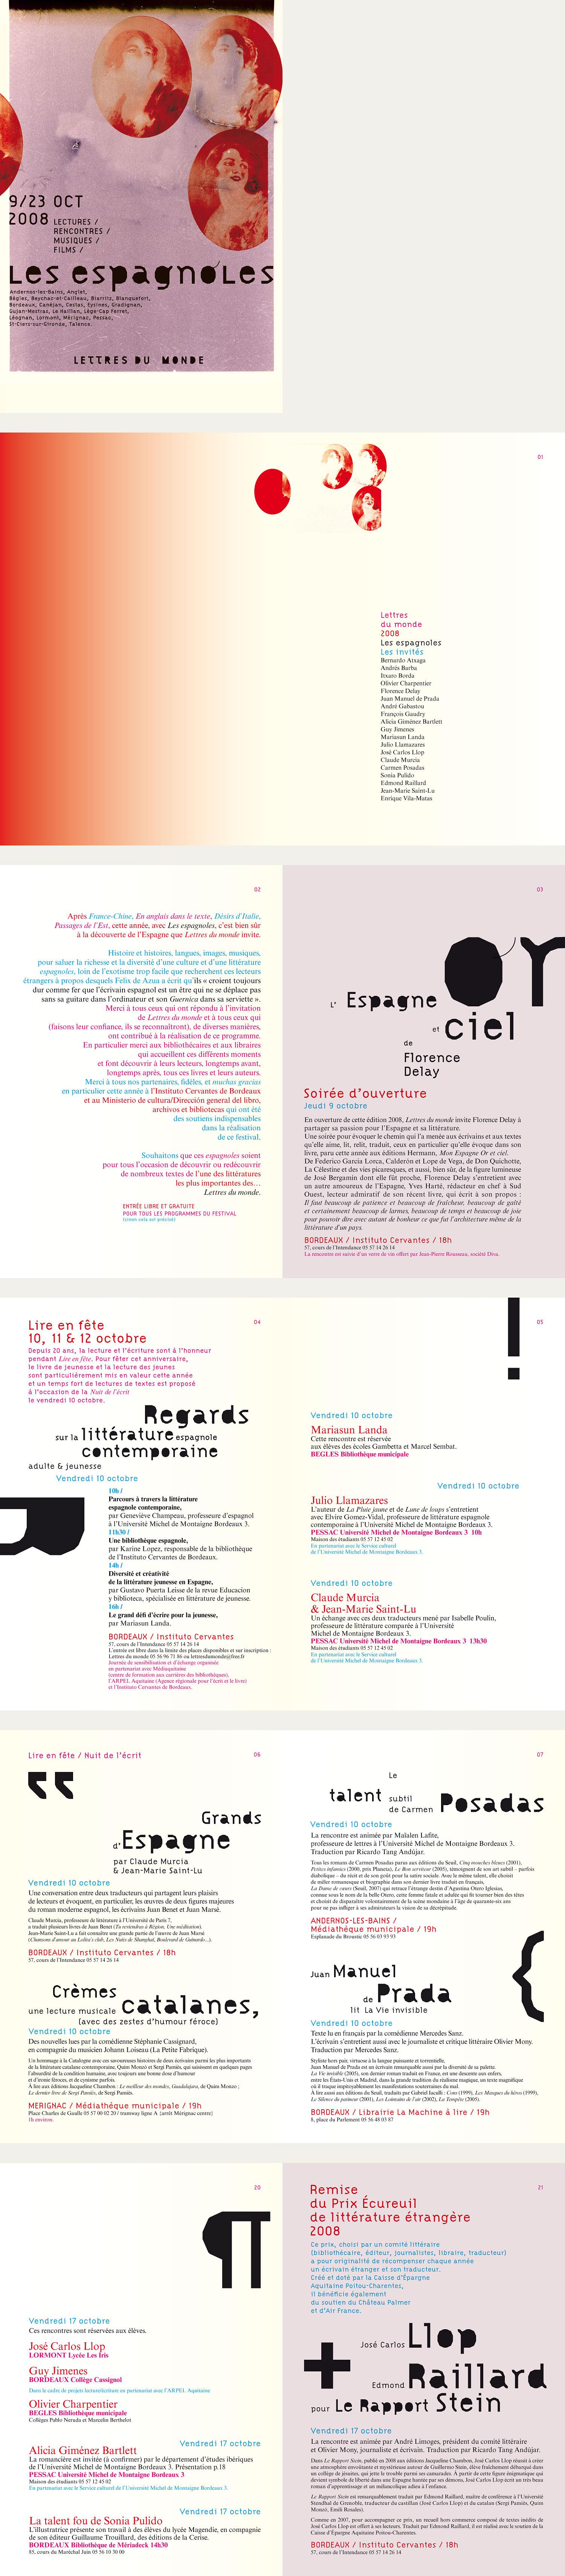 MrThornill-graphisme-lettresmonde-les-espagnoles-2008-ph2